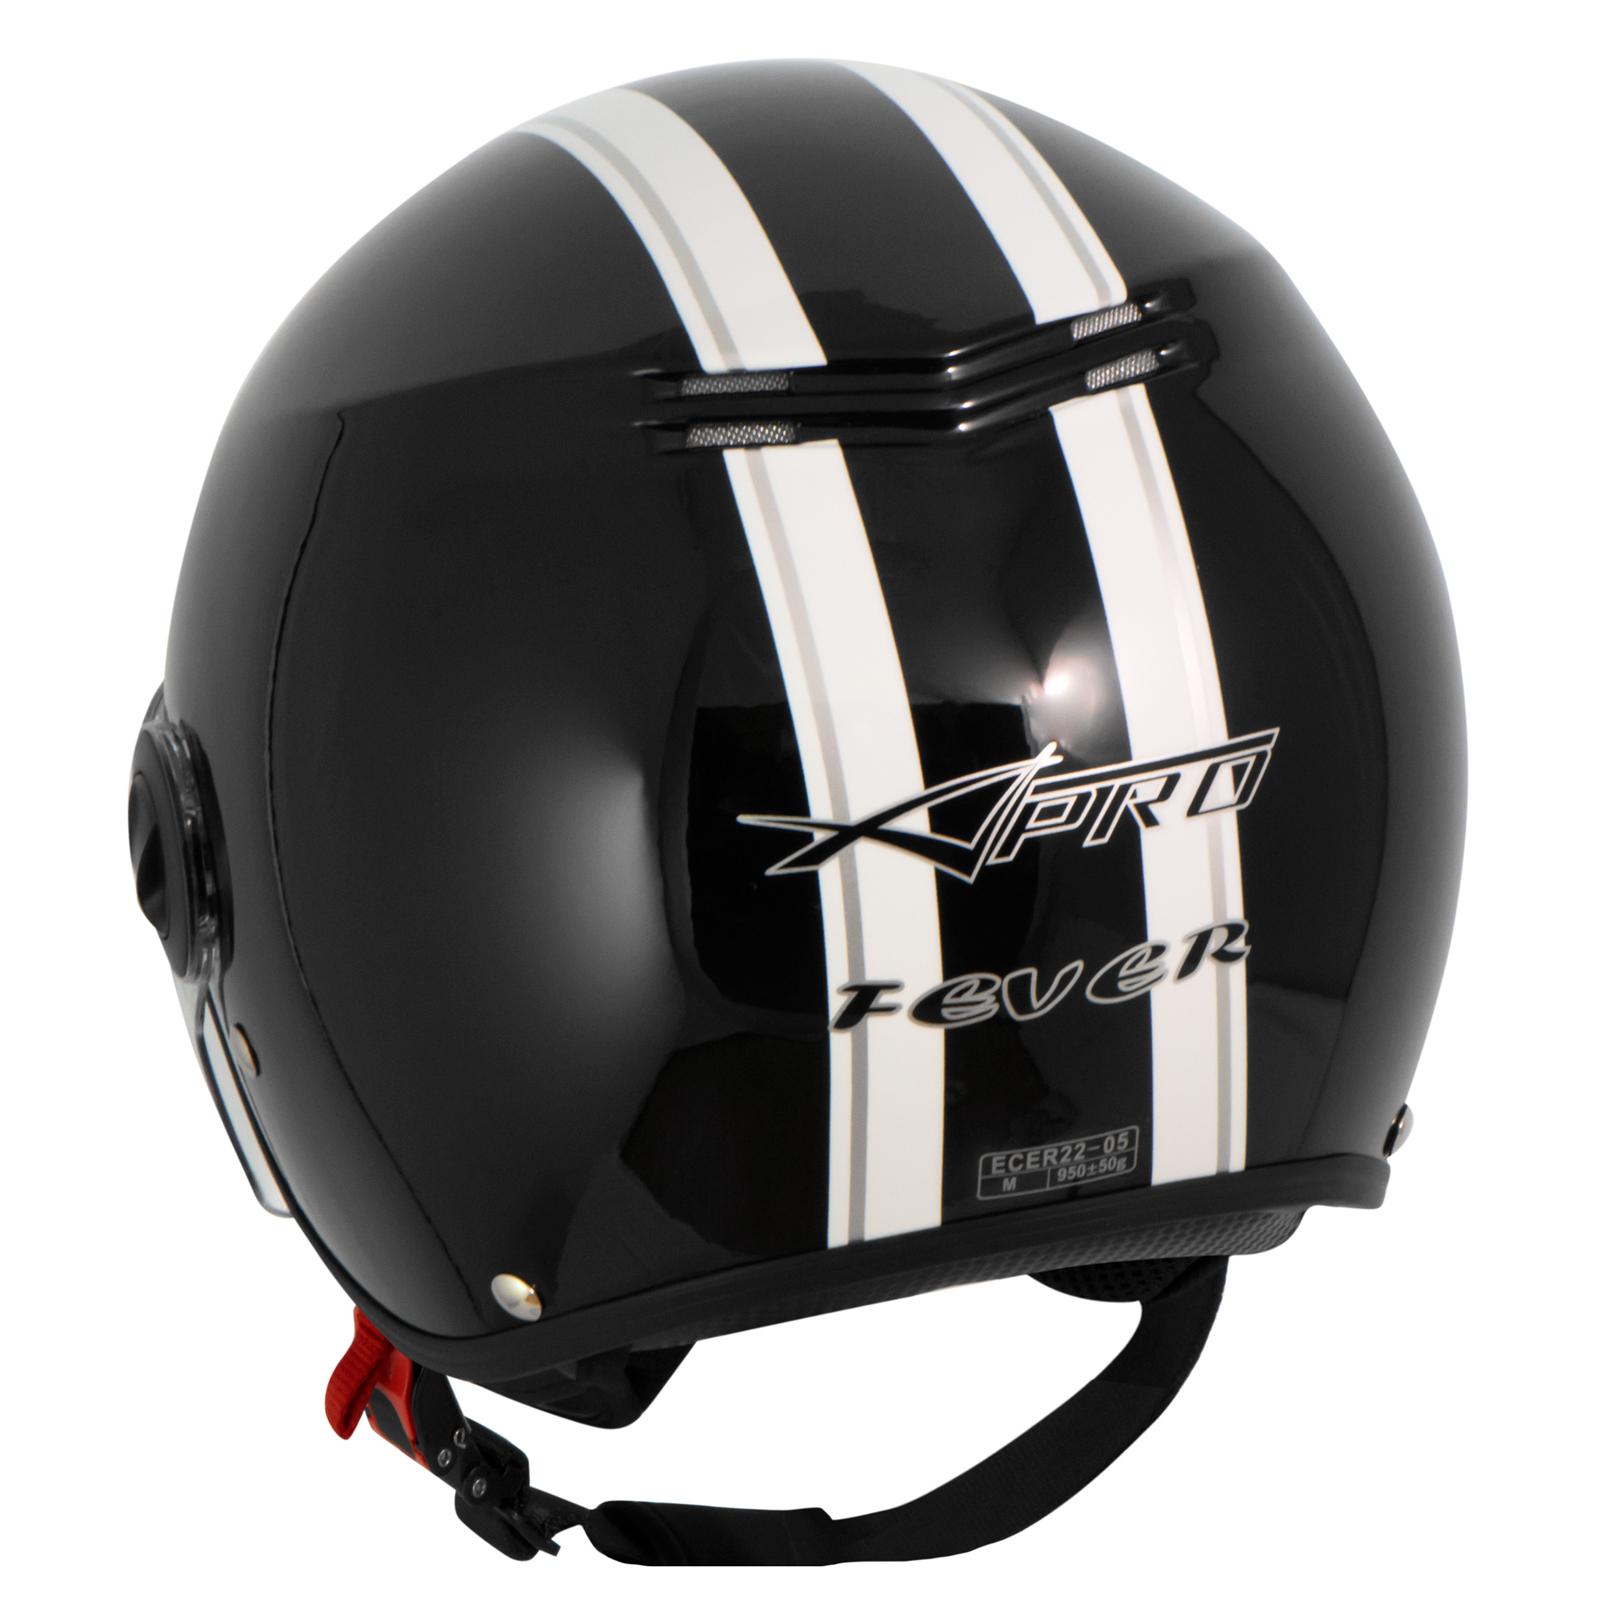 casque avec moto scooter quad jet visiere ece 22 noir sonicmoto ebay. Black Bedroom Furniture Sets. Home Design Ideas